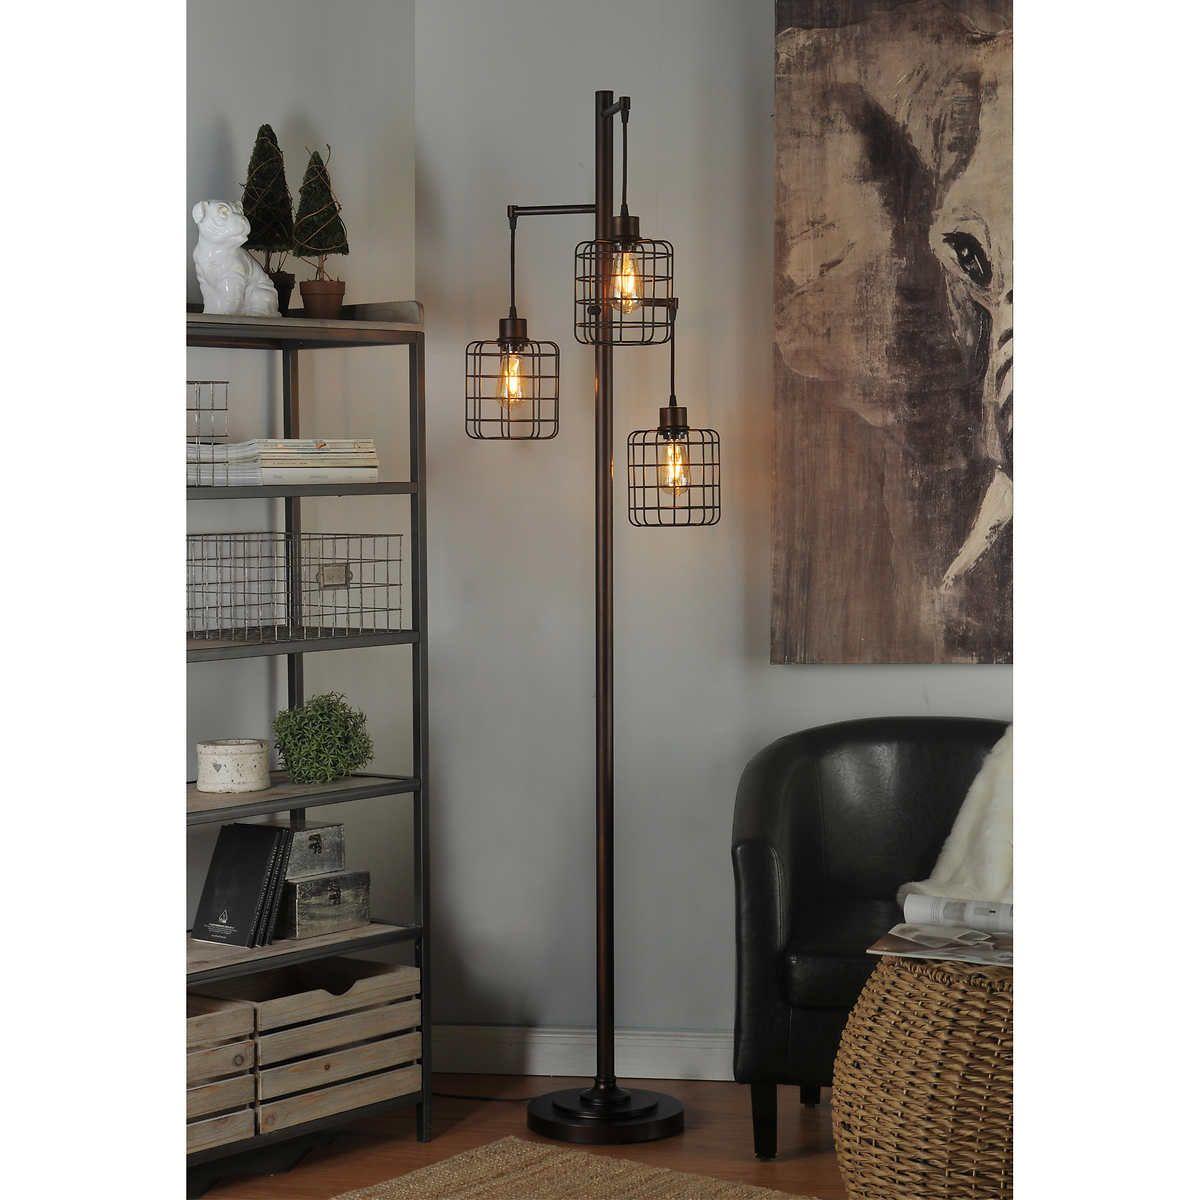 Piper Floor Lamp Lamps living room, Industrial